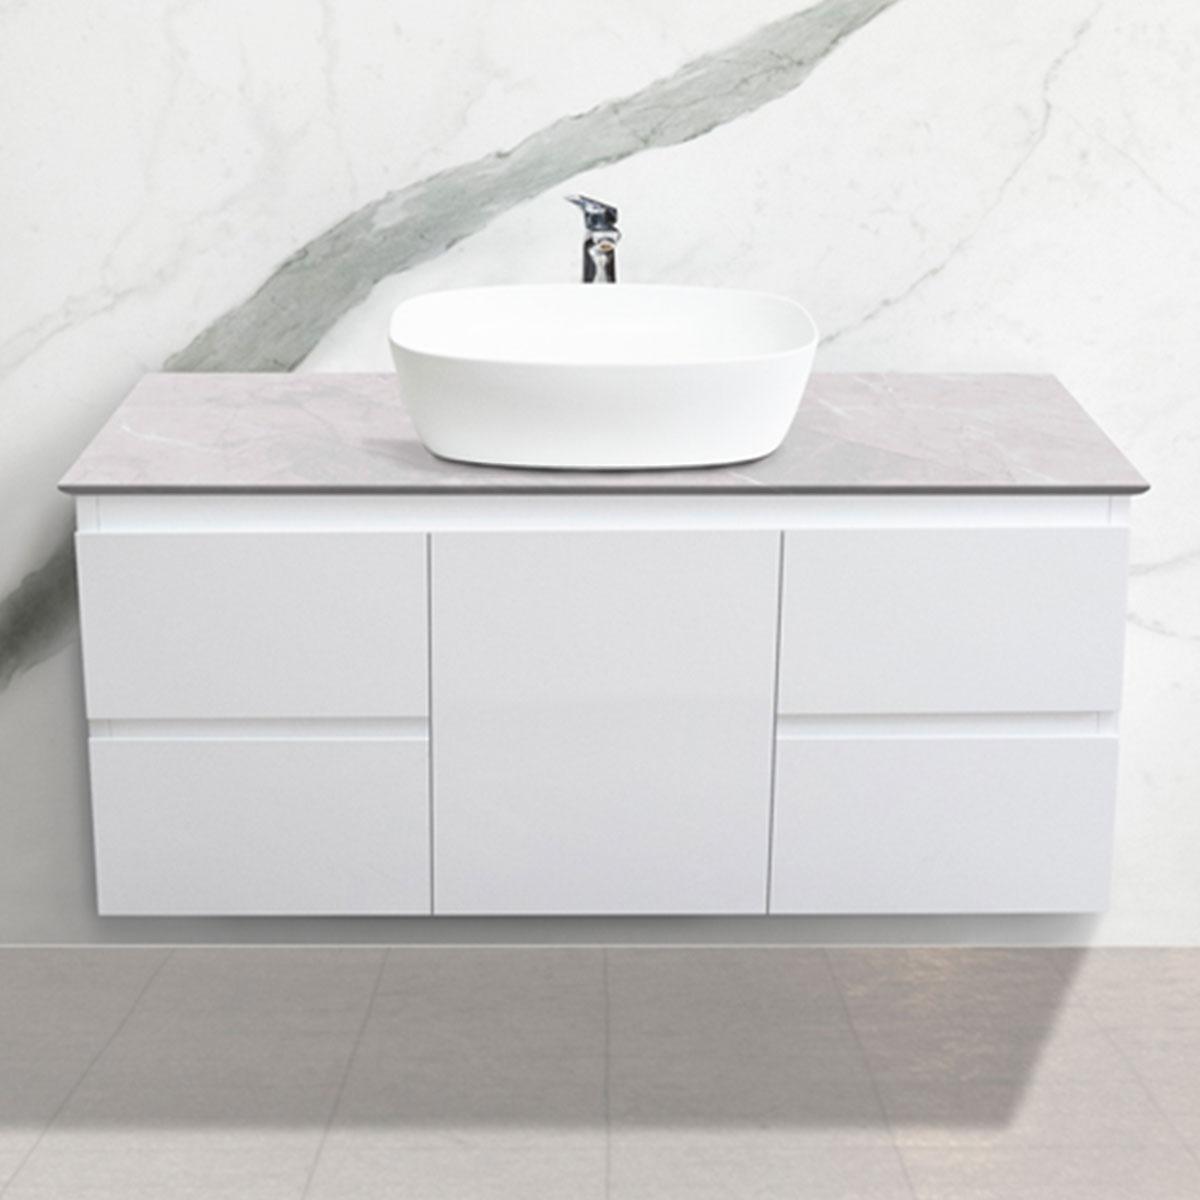 Cabinet - Vanity- 1 Door + 4 Drawers - Ice Grey - Stone3 Brisbane